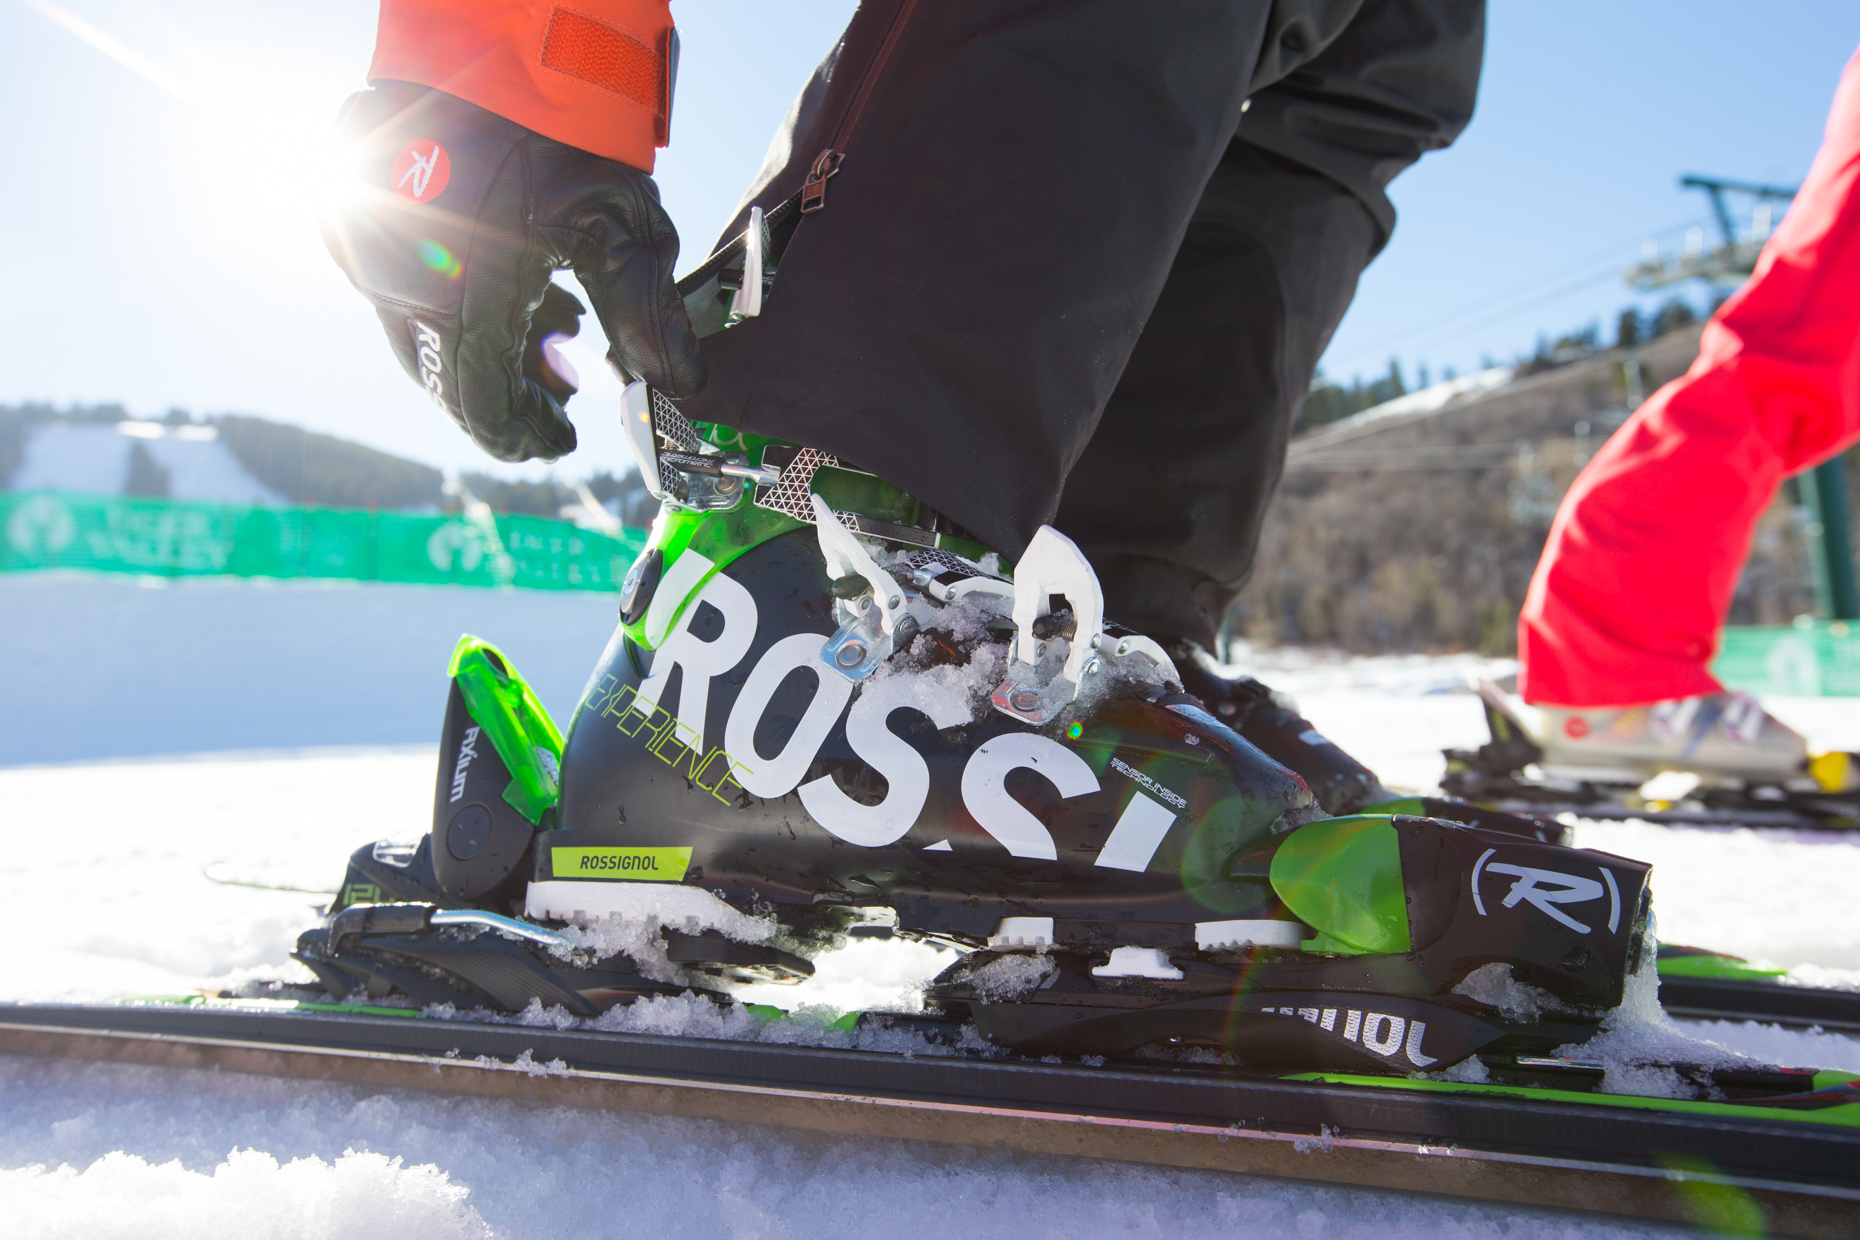 Ski Butlers image 2